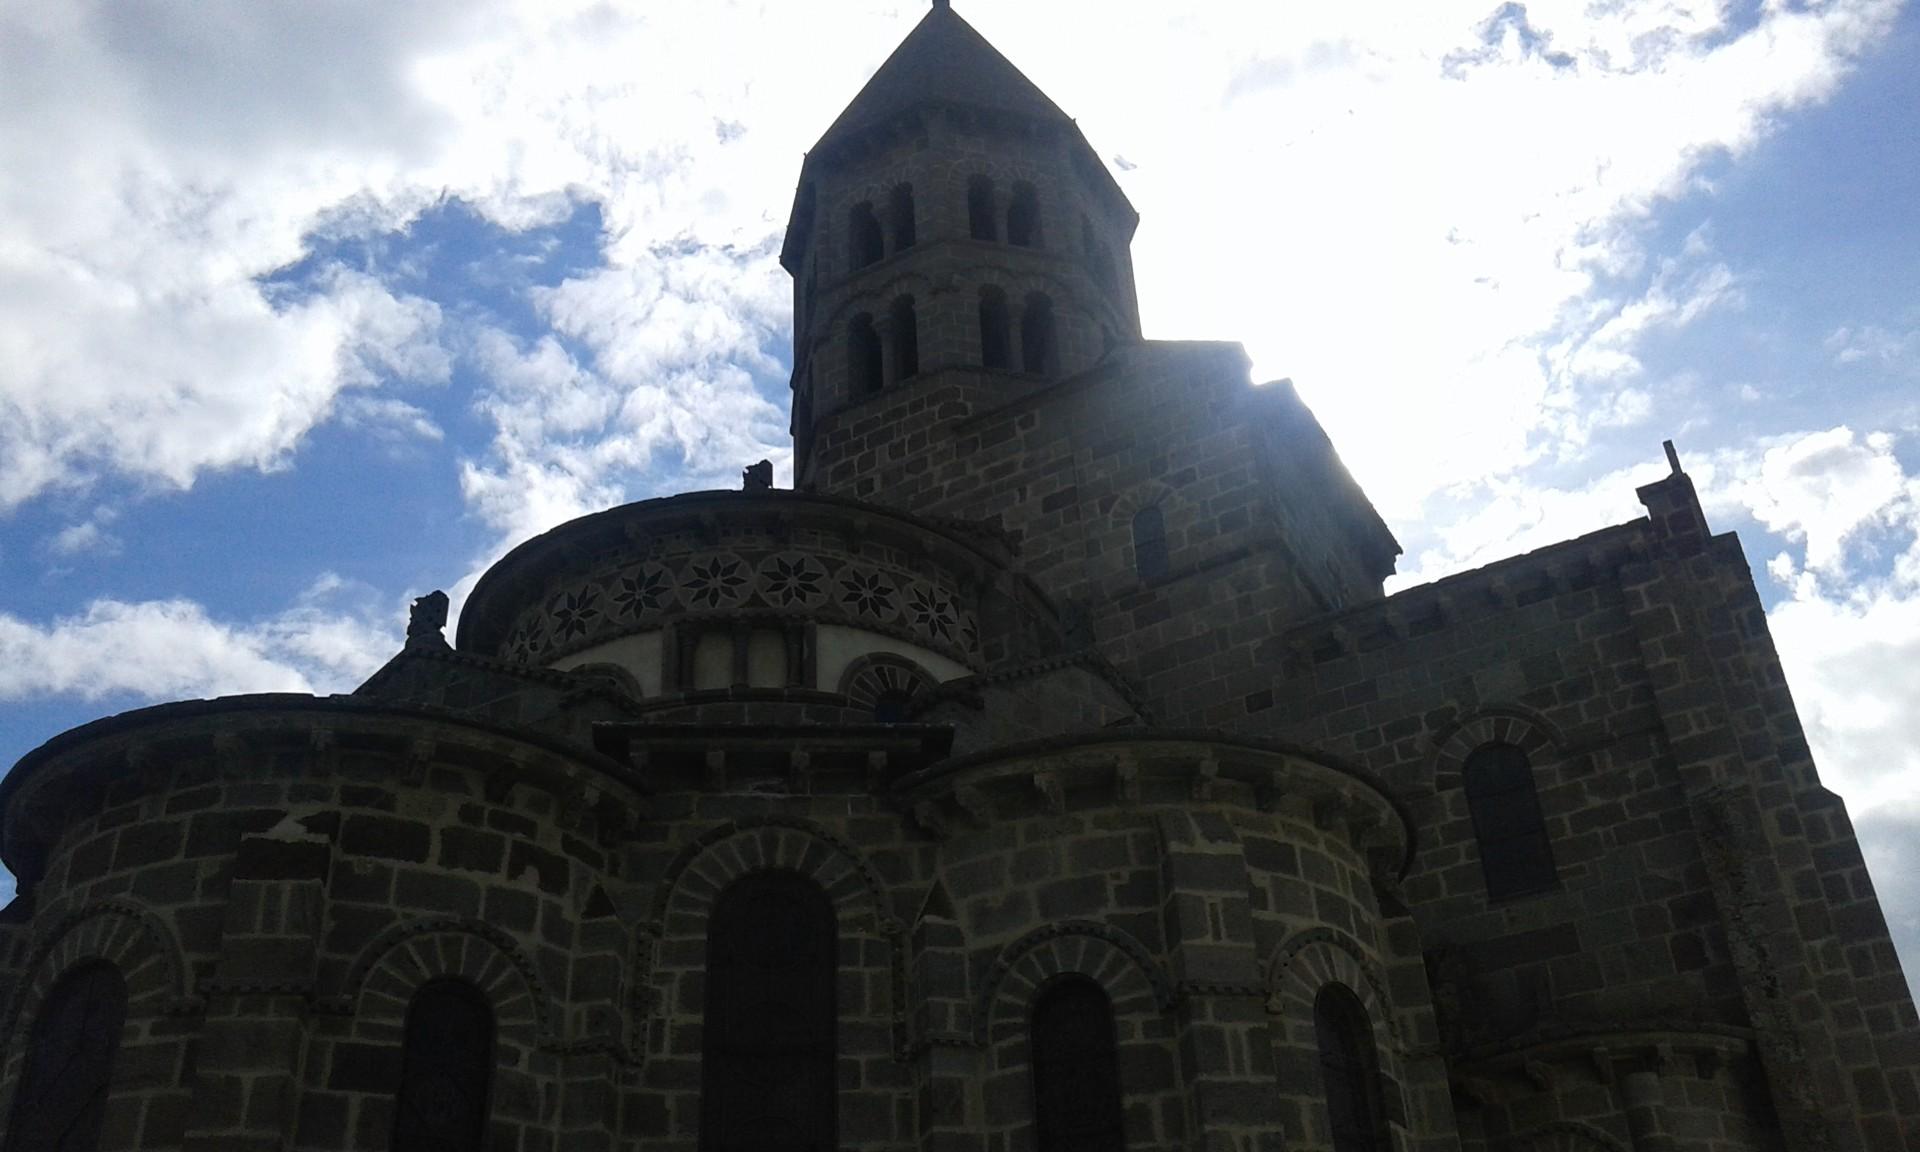 passeggiata-saint-nectaire-3e5befb1112d0